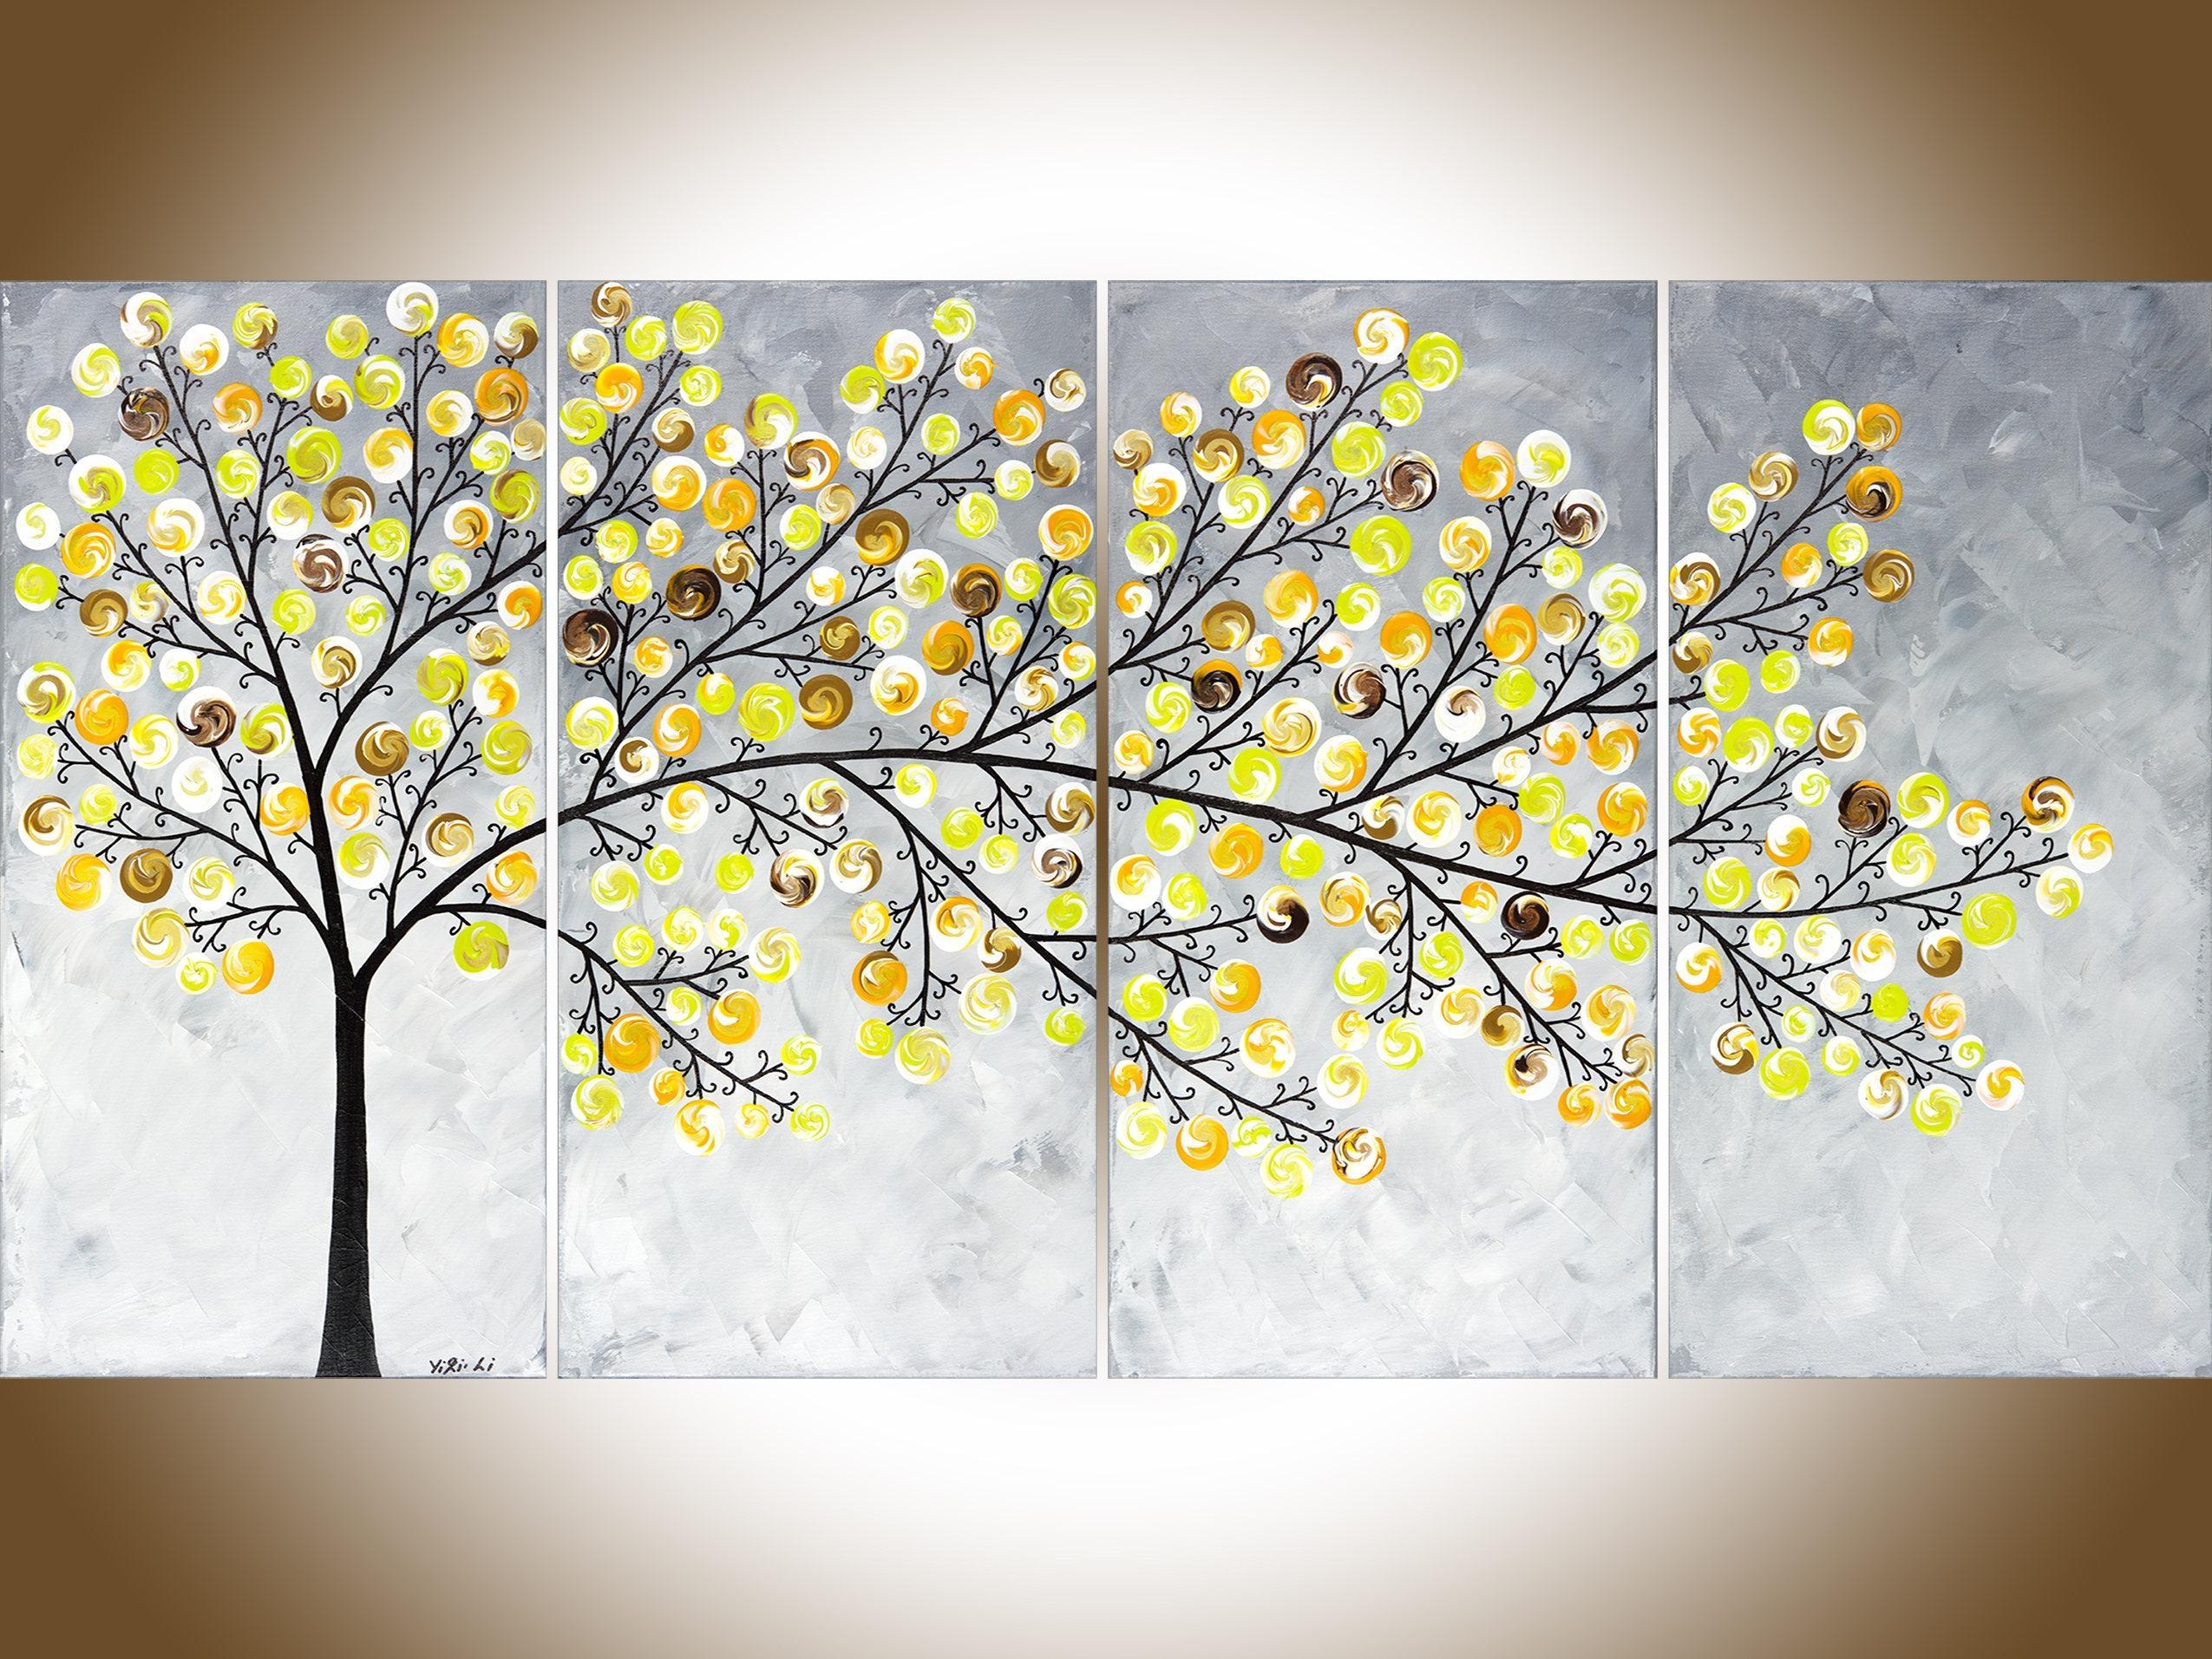 Abstract Painting Yellow Grey Painting Large Wall Art Modern Regarding Yellow Grey Wall Art (View 4 of 20)